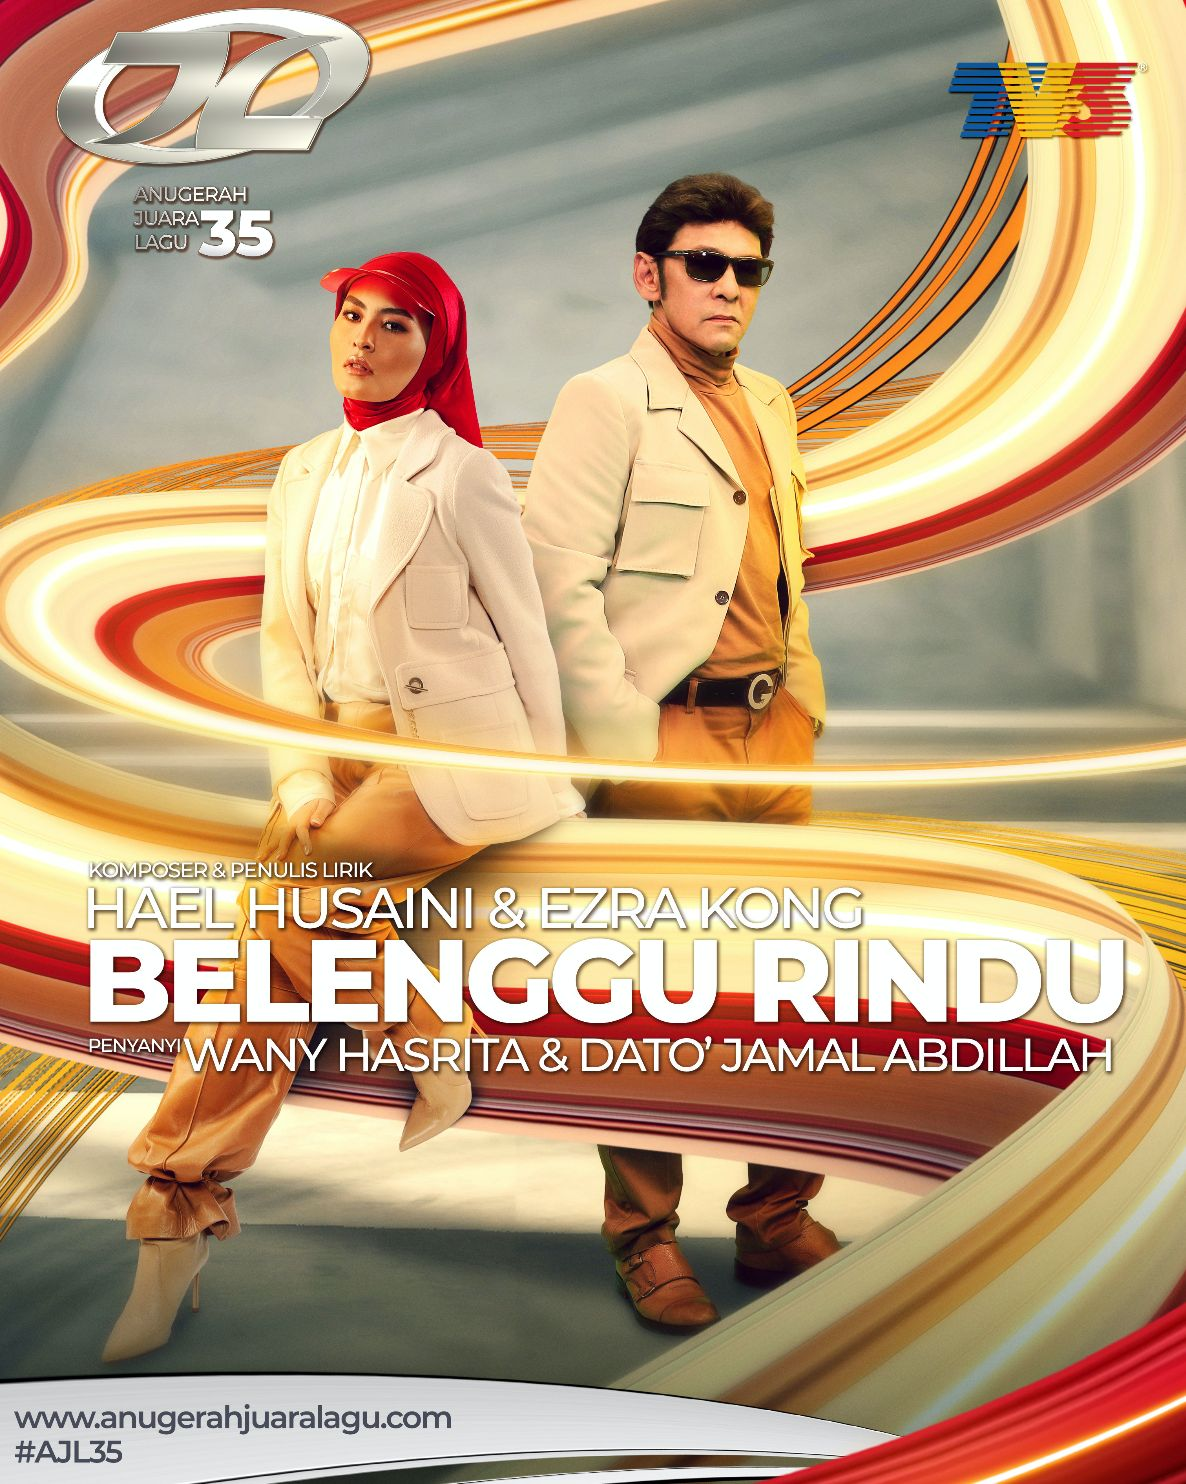 Belenggu Rindu - Wany Hasrita & Dato' Jamal Abdillah